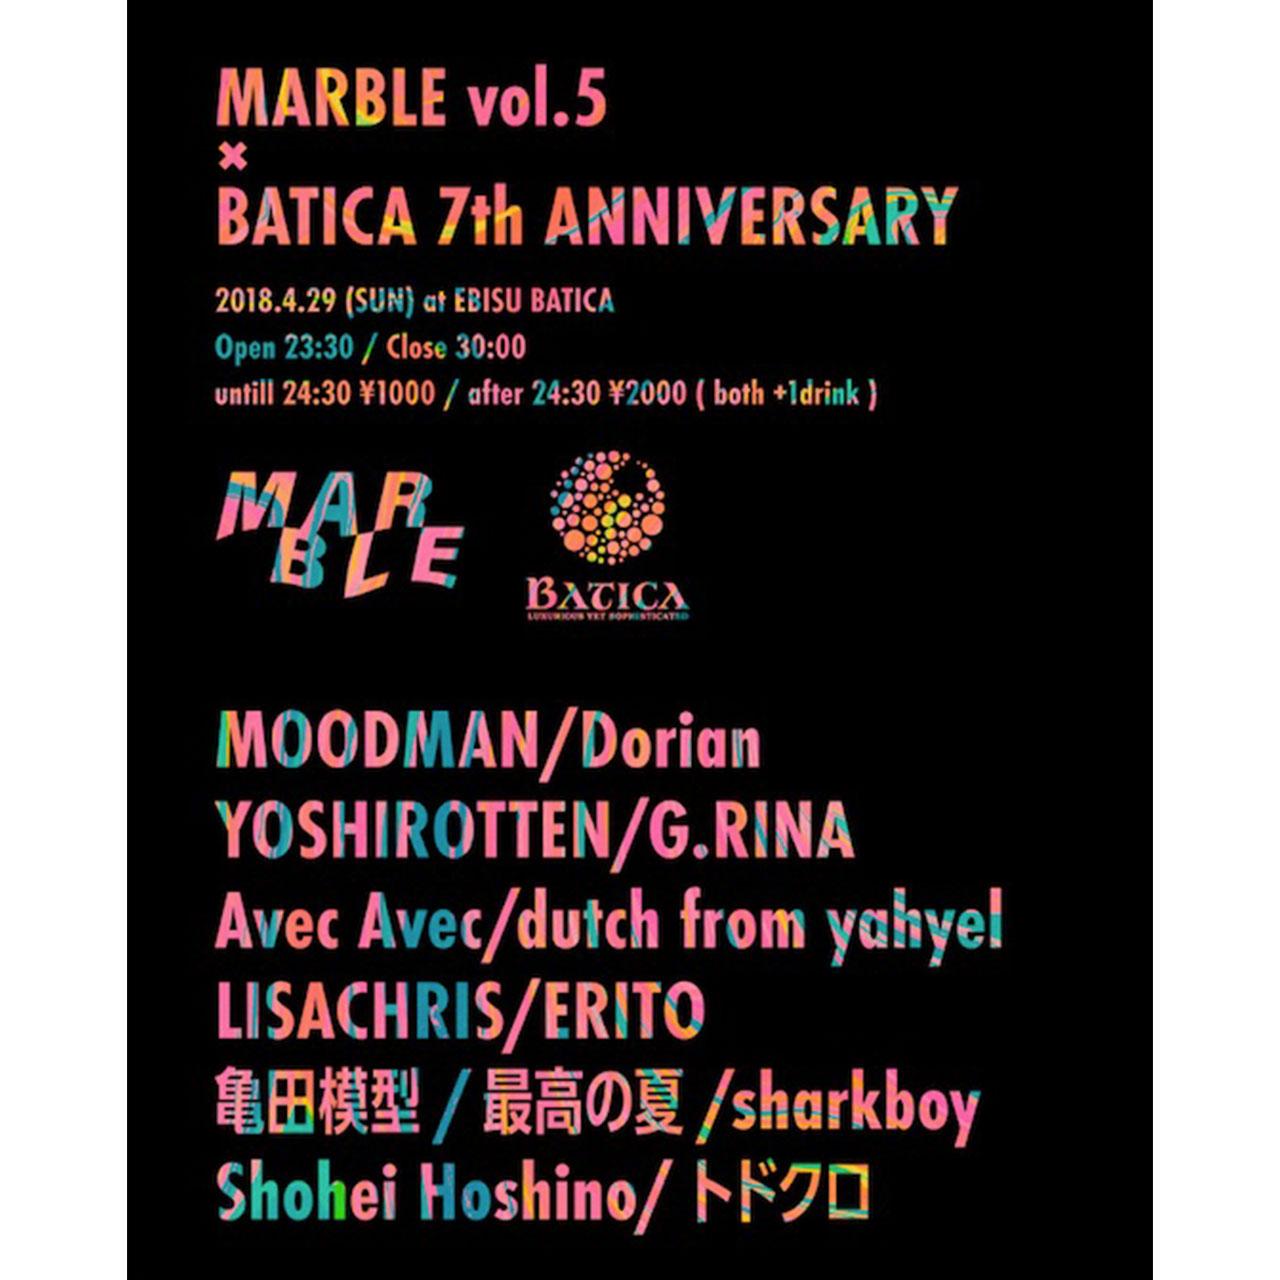 YOSHIROTTEN、YUKA MIZUHARA、LISACHRISら総勢125組が出演!EBISU BATICAの7周年アニバーサリーイベント開催